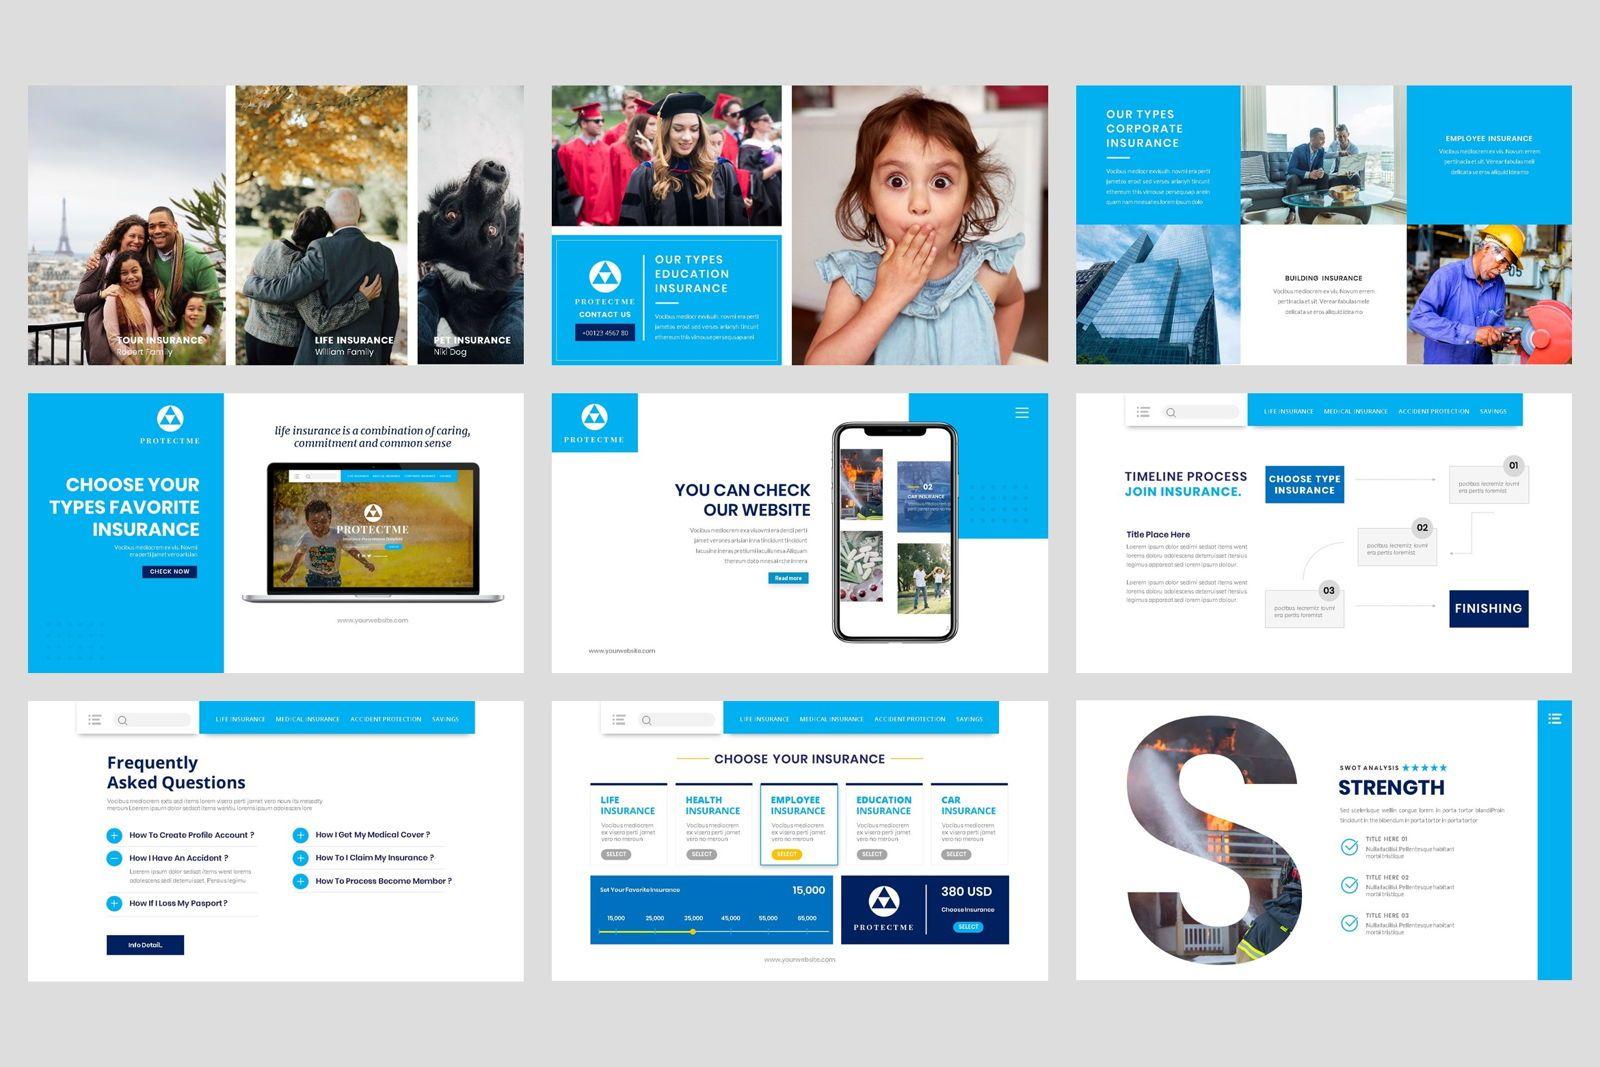 Insurance - Business Consultant Google Slide Template, Slide 4, 08571, Presentation Templates — PoweredTemplate.com